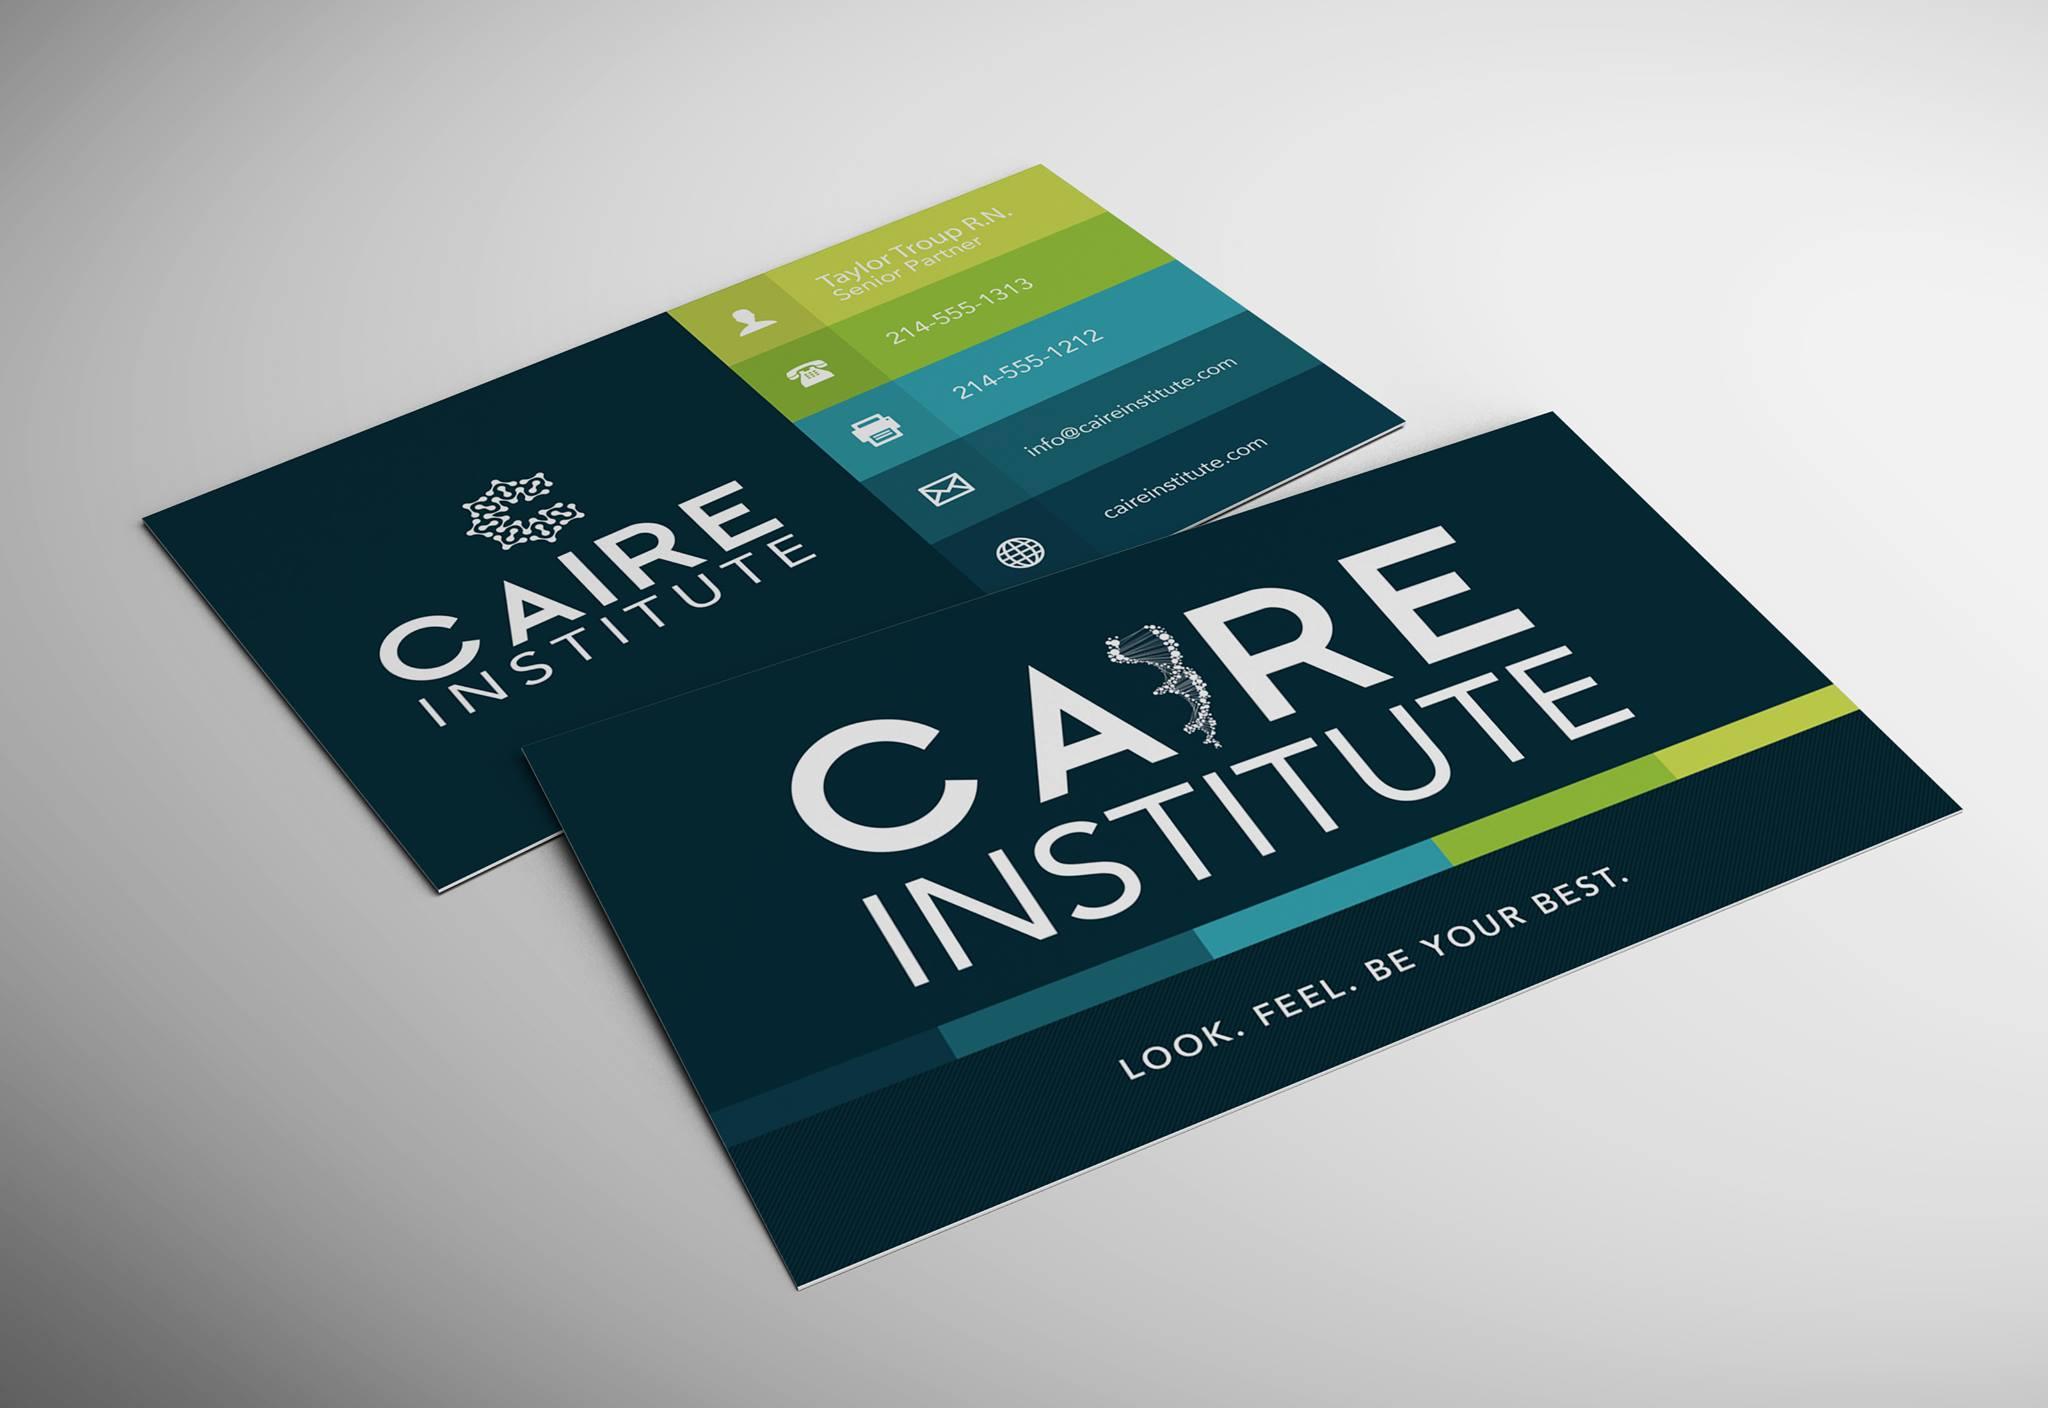 Caire Institute Custom Business Cards ChemistCreative